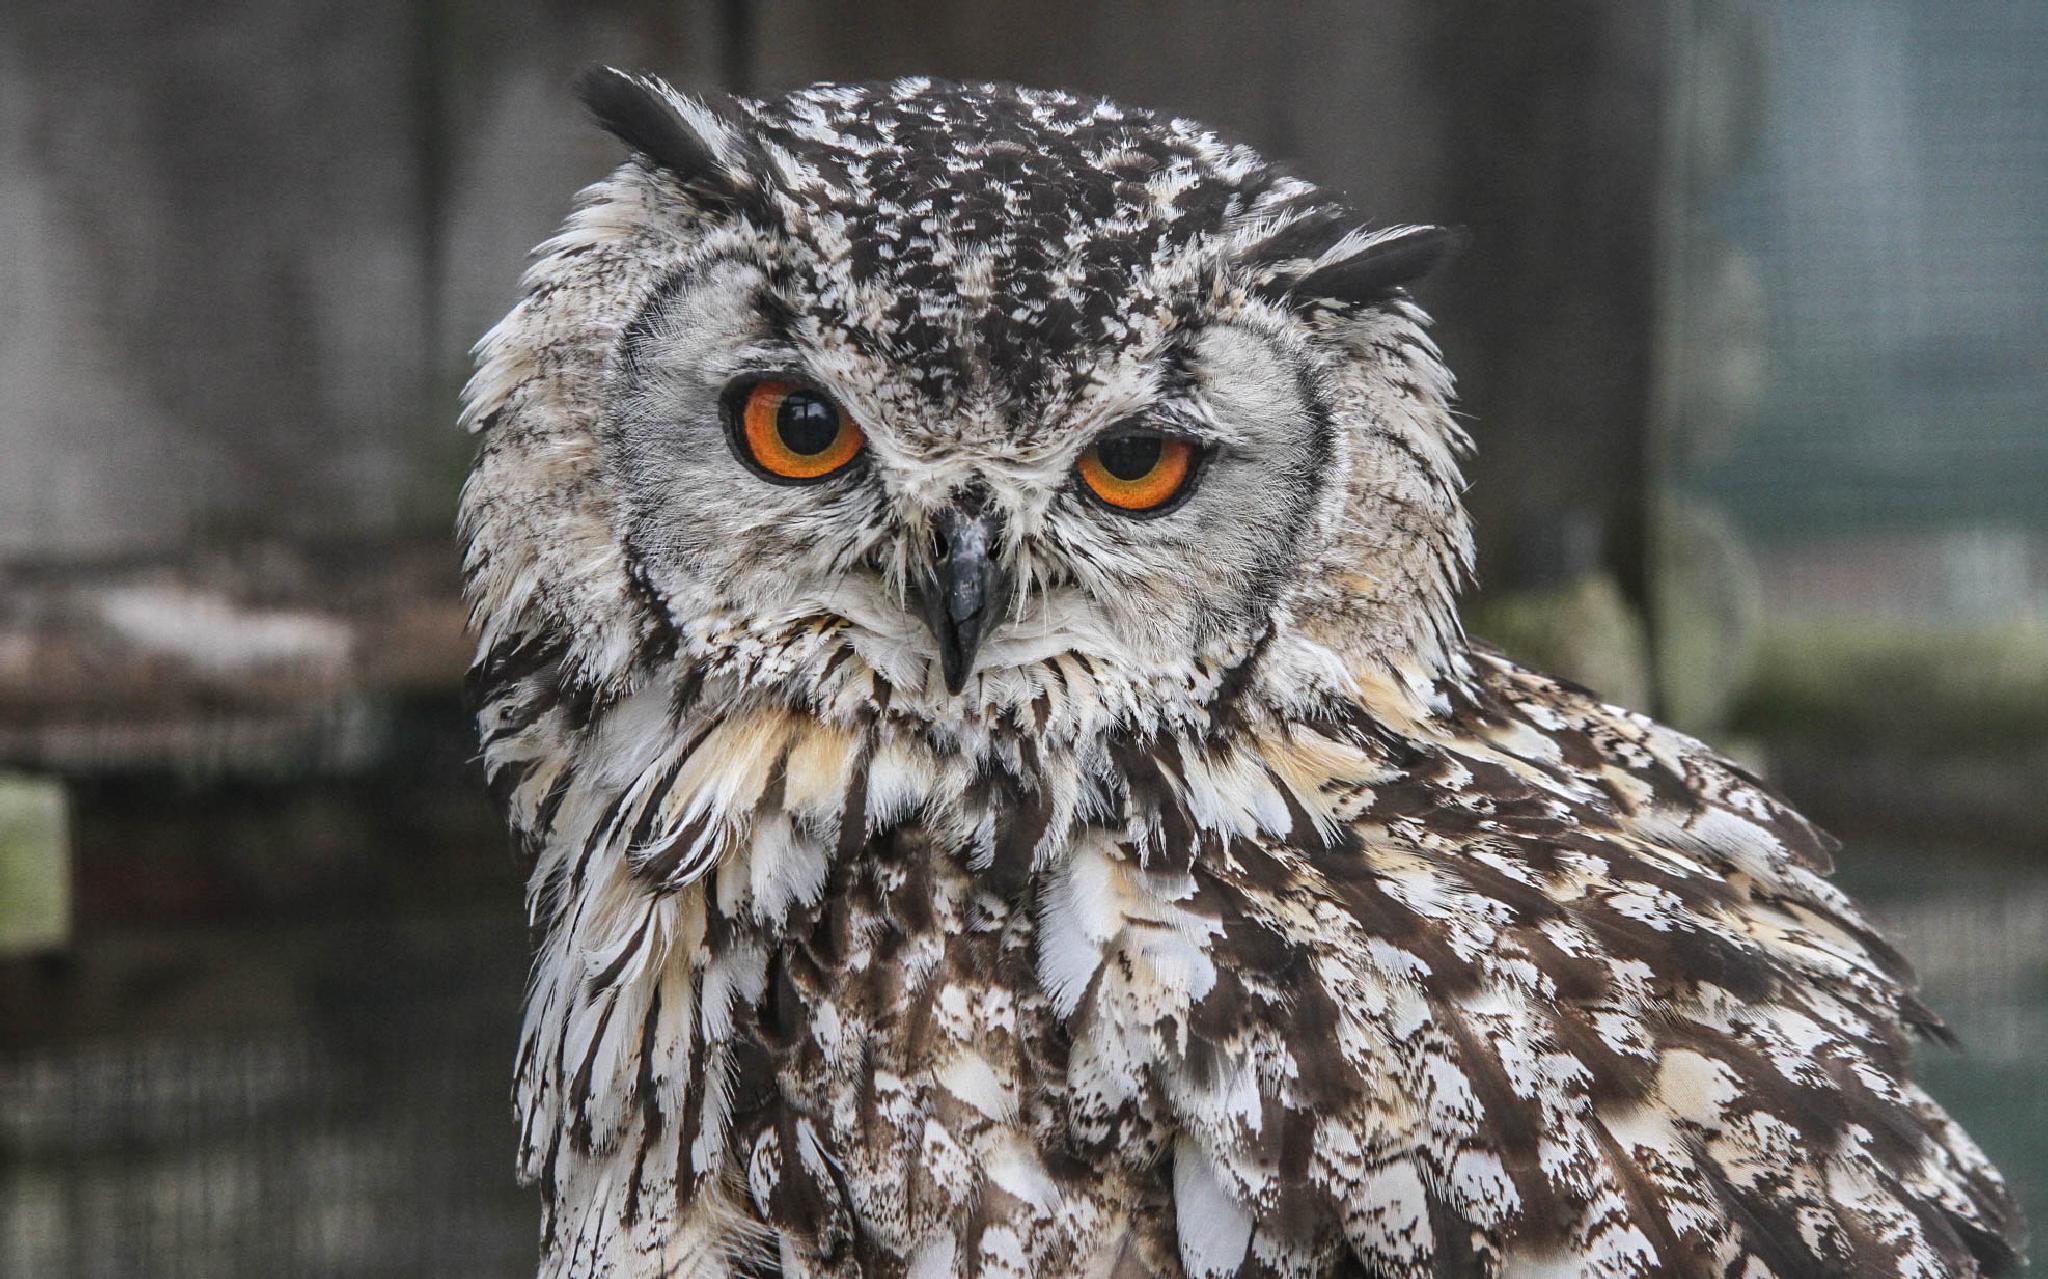 Eagle owl by garry-chisholm1